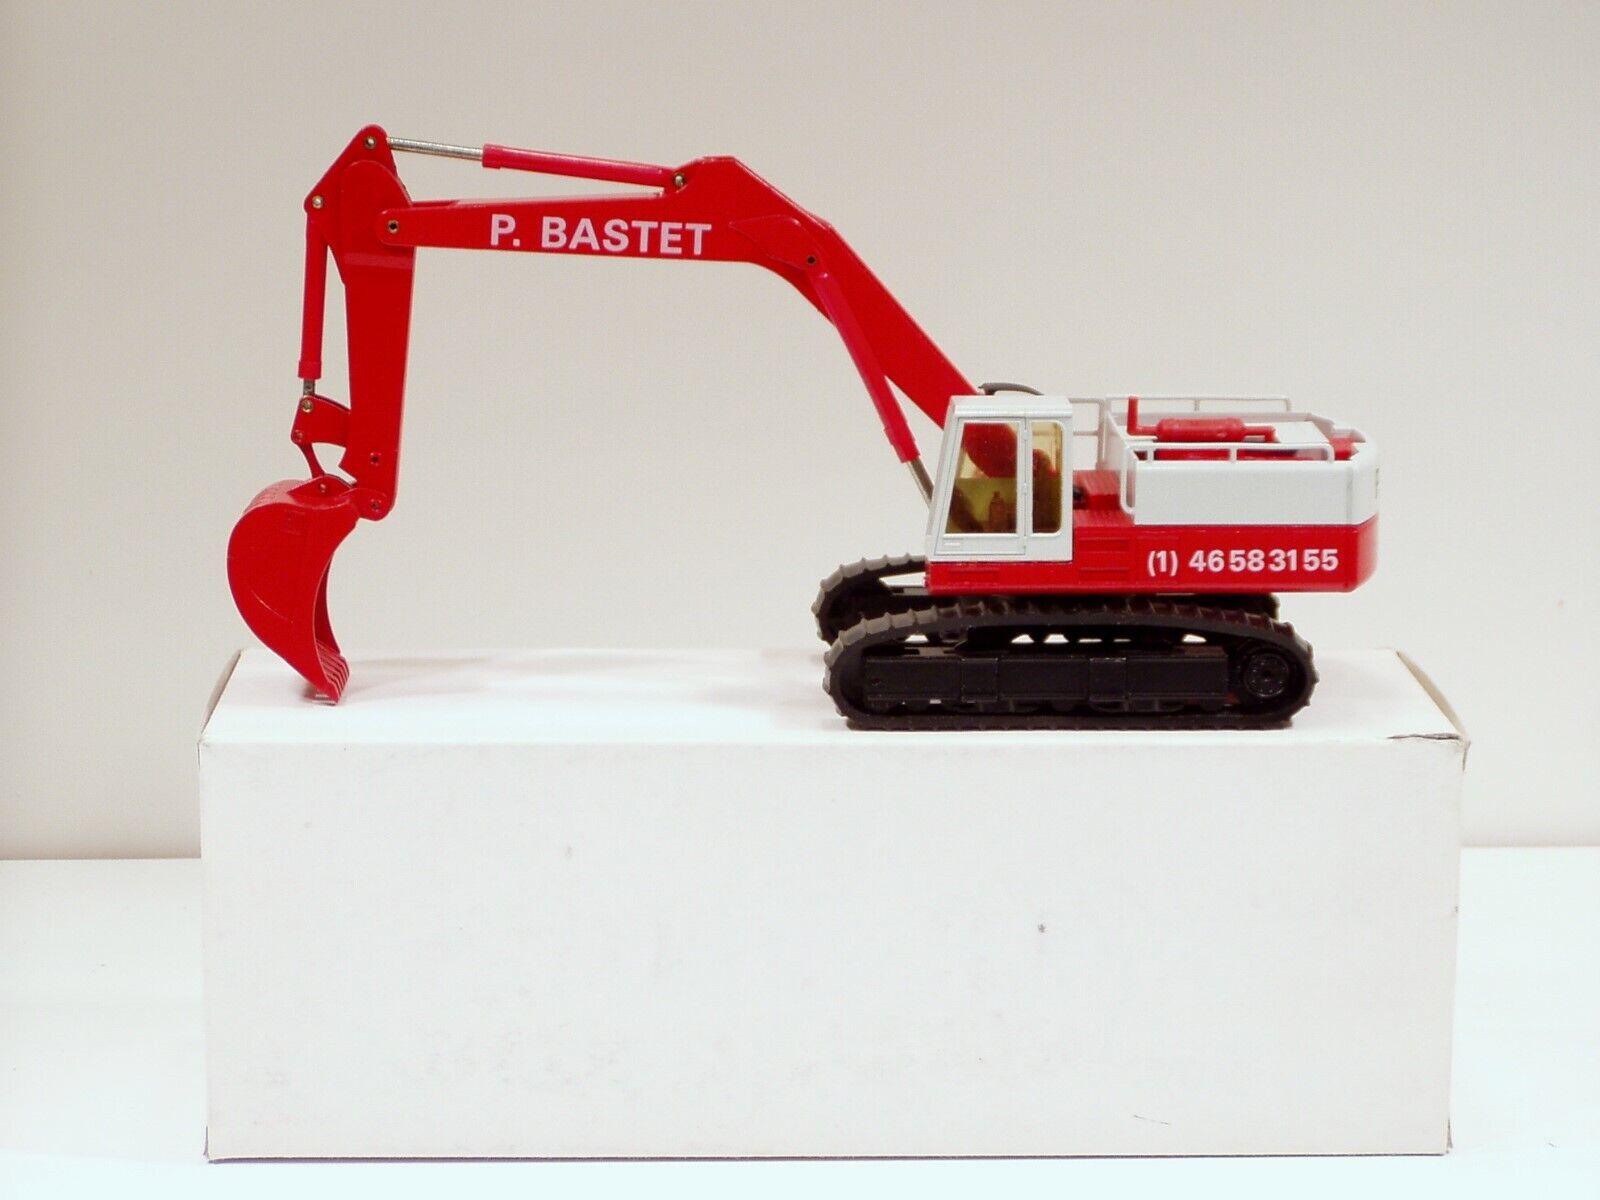 POCLAIN 350 Excavateur  P. BASTET  - 1 50  - Conrad  2891 - Comme neuf IN BOX  acheter des rabais